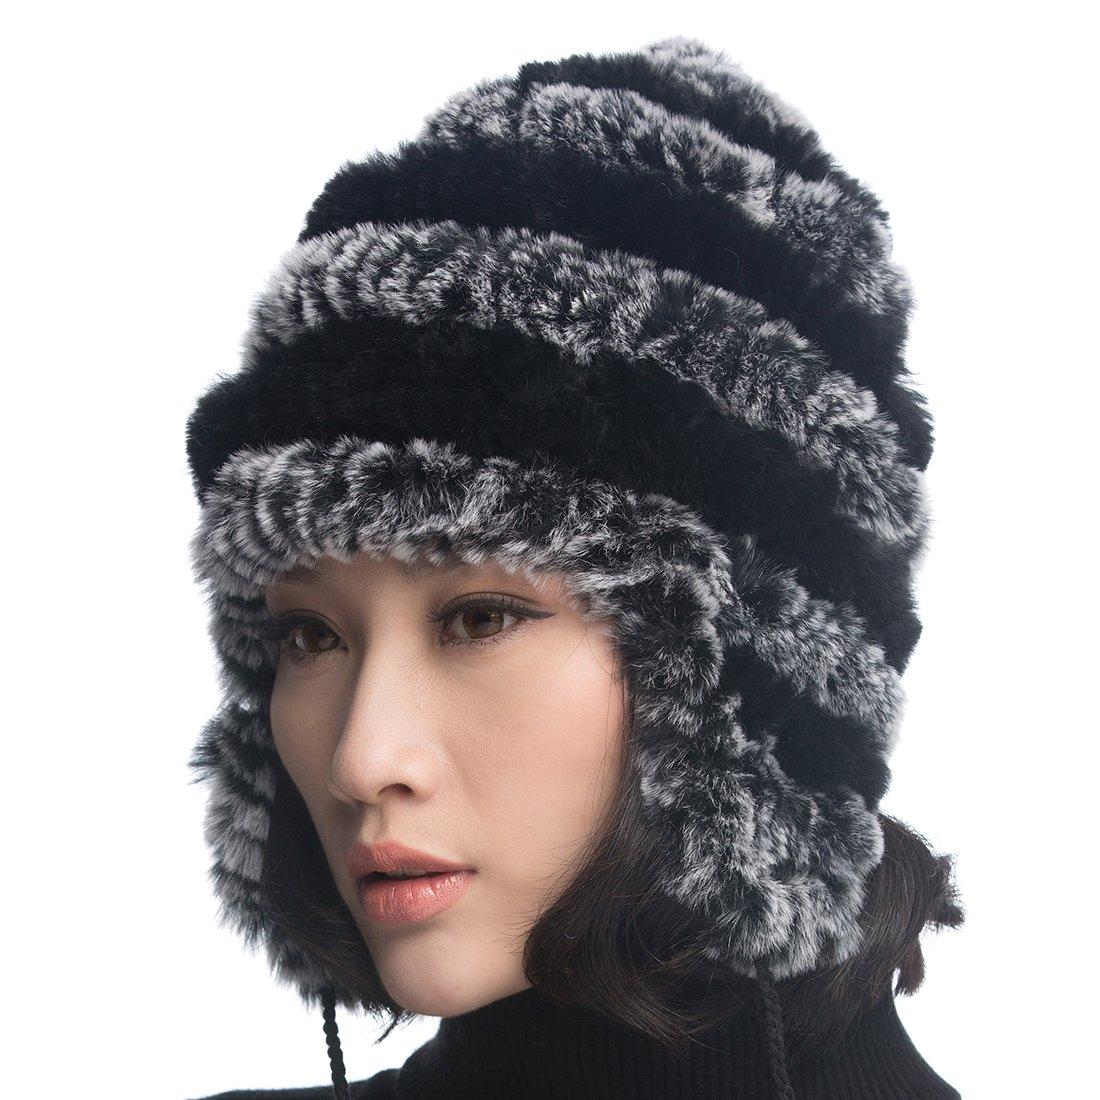 URSFUR Women's Rex Rabbit Fur Hats Winter Ear Cap Flexible Multicolor (Grey & Black)